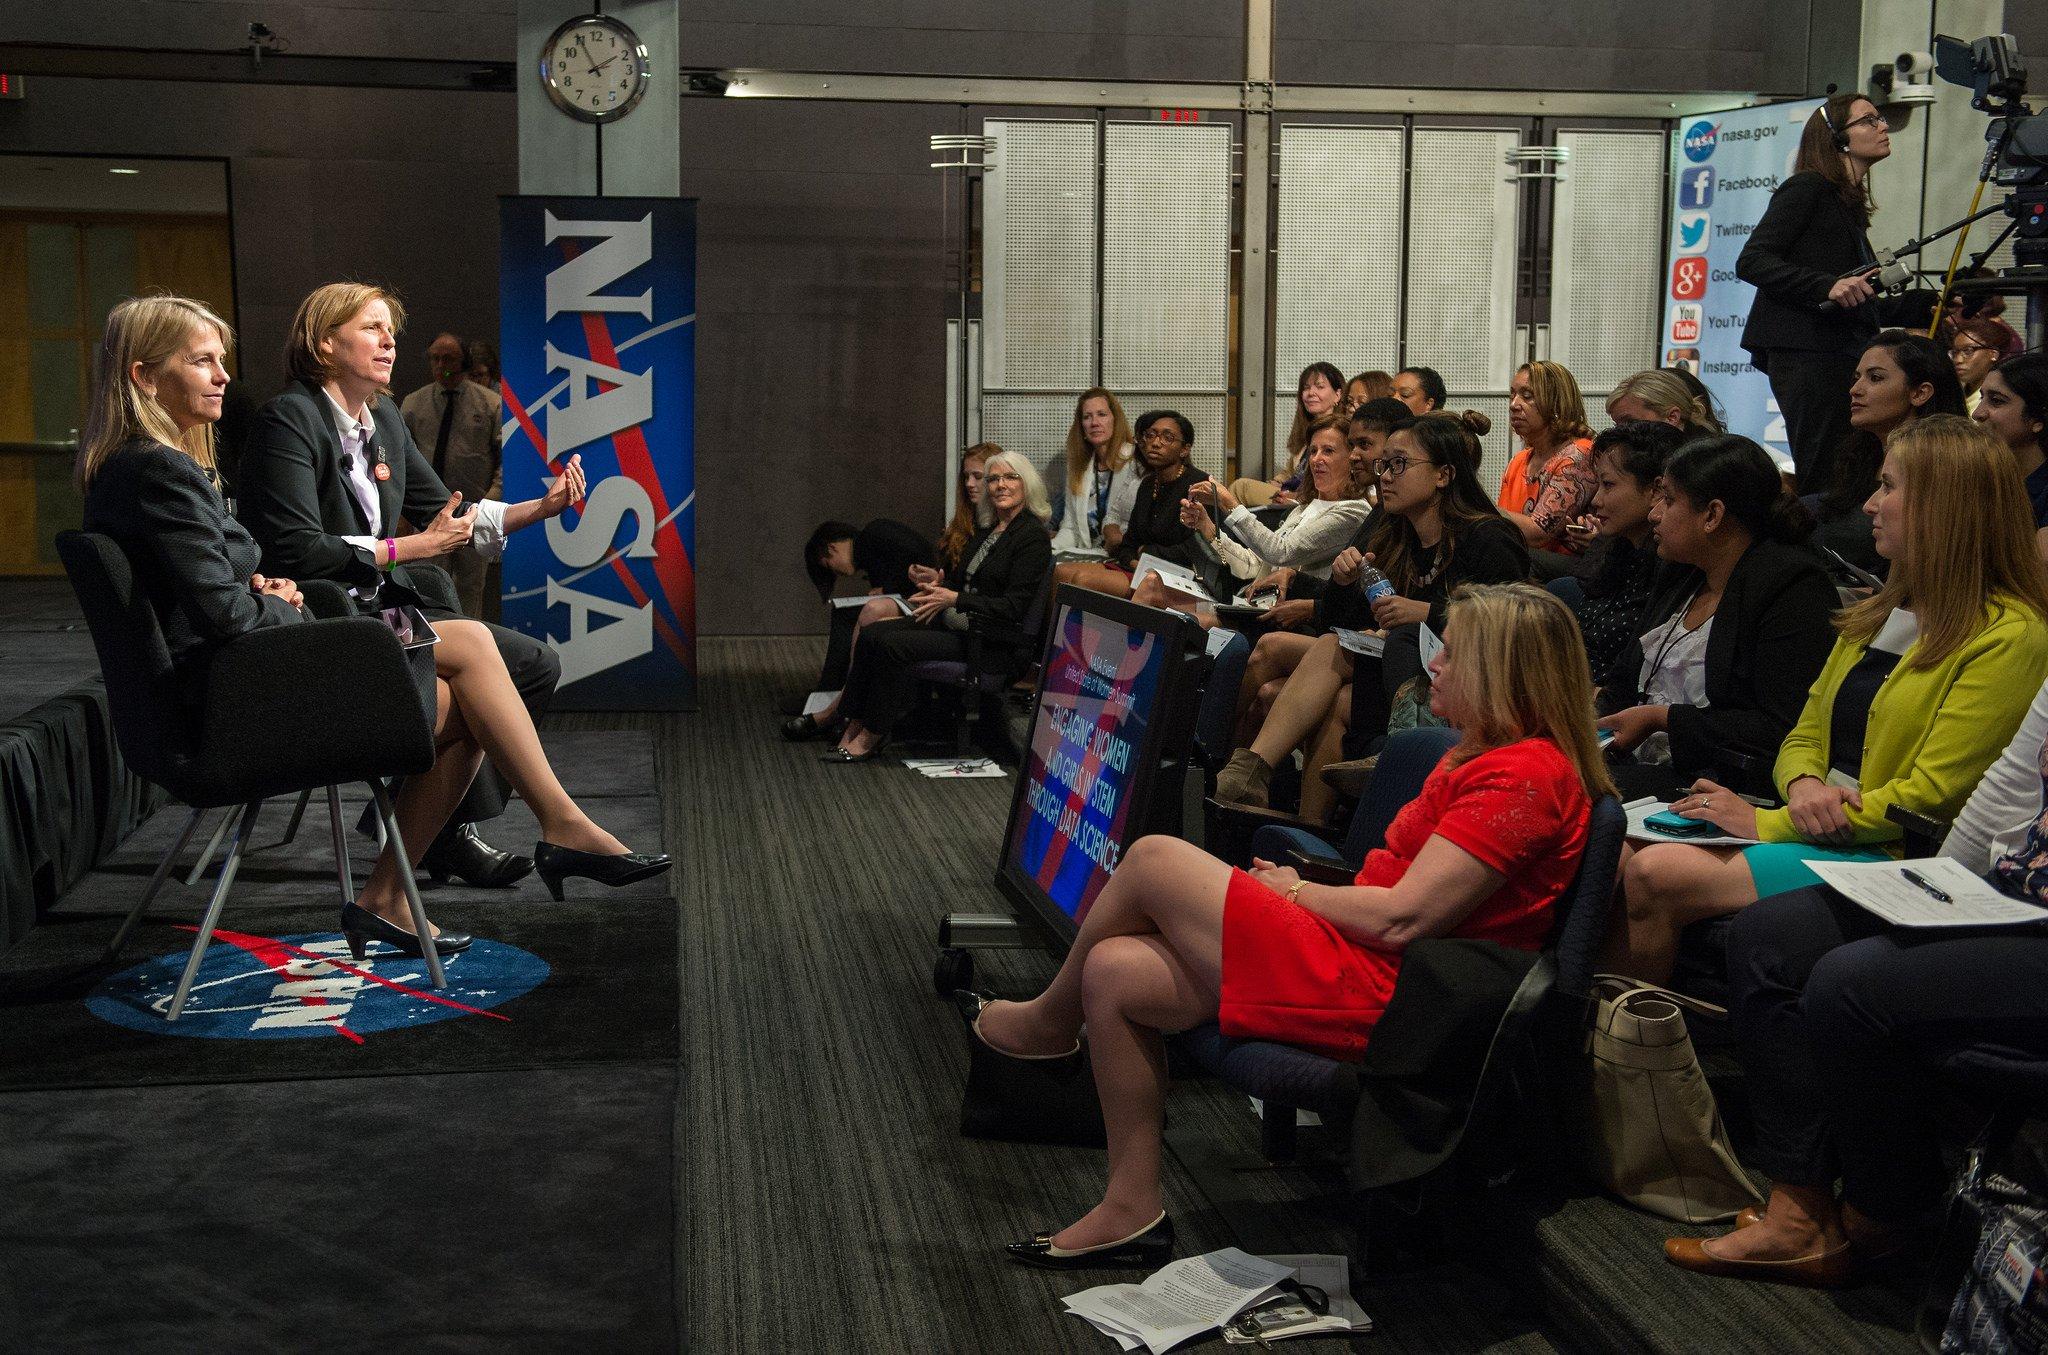 NASA's Deputy Dr. Dava Newman and USCTO Megan Smith addressing participants at NASA's White House United State of Women Summit event. Photo Credit: NASA/Aubrey Gemignani